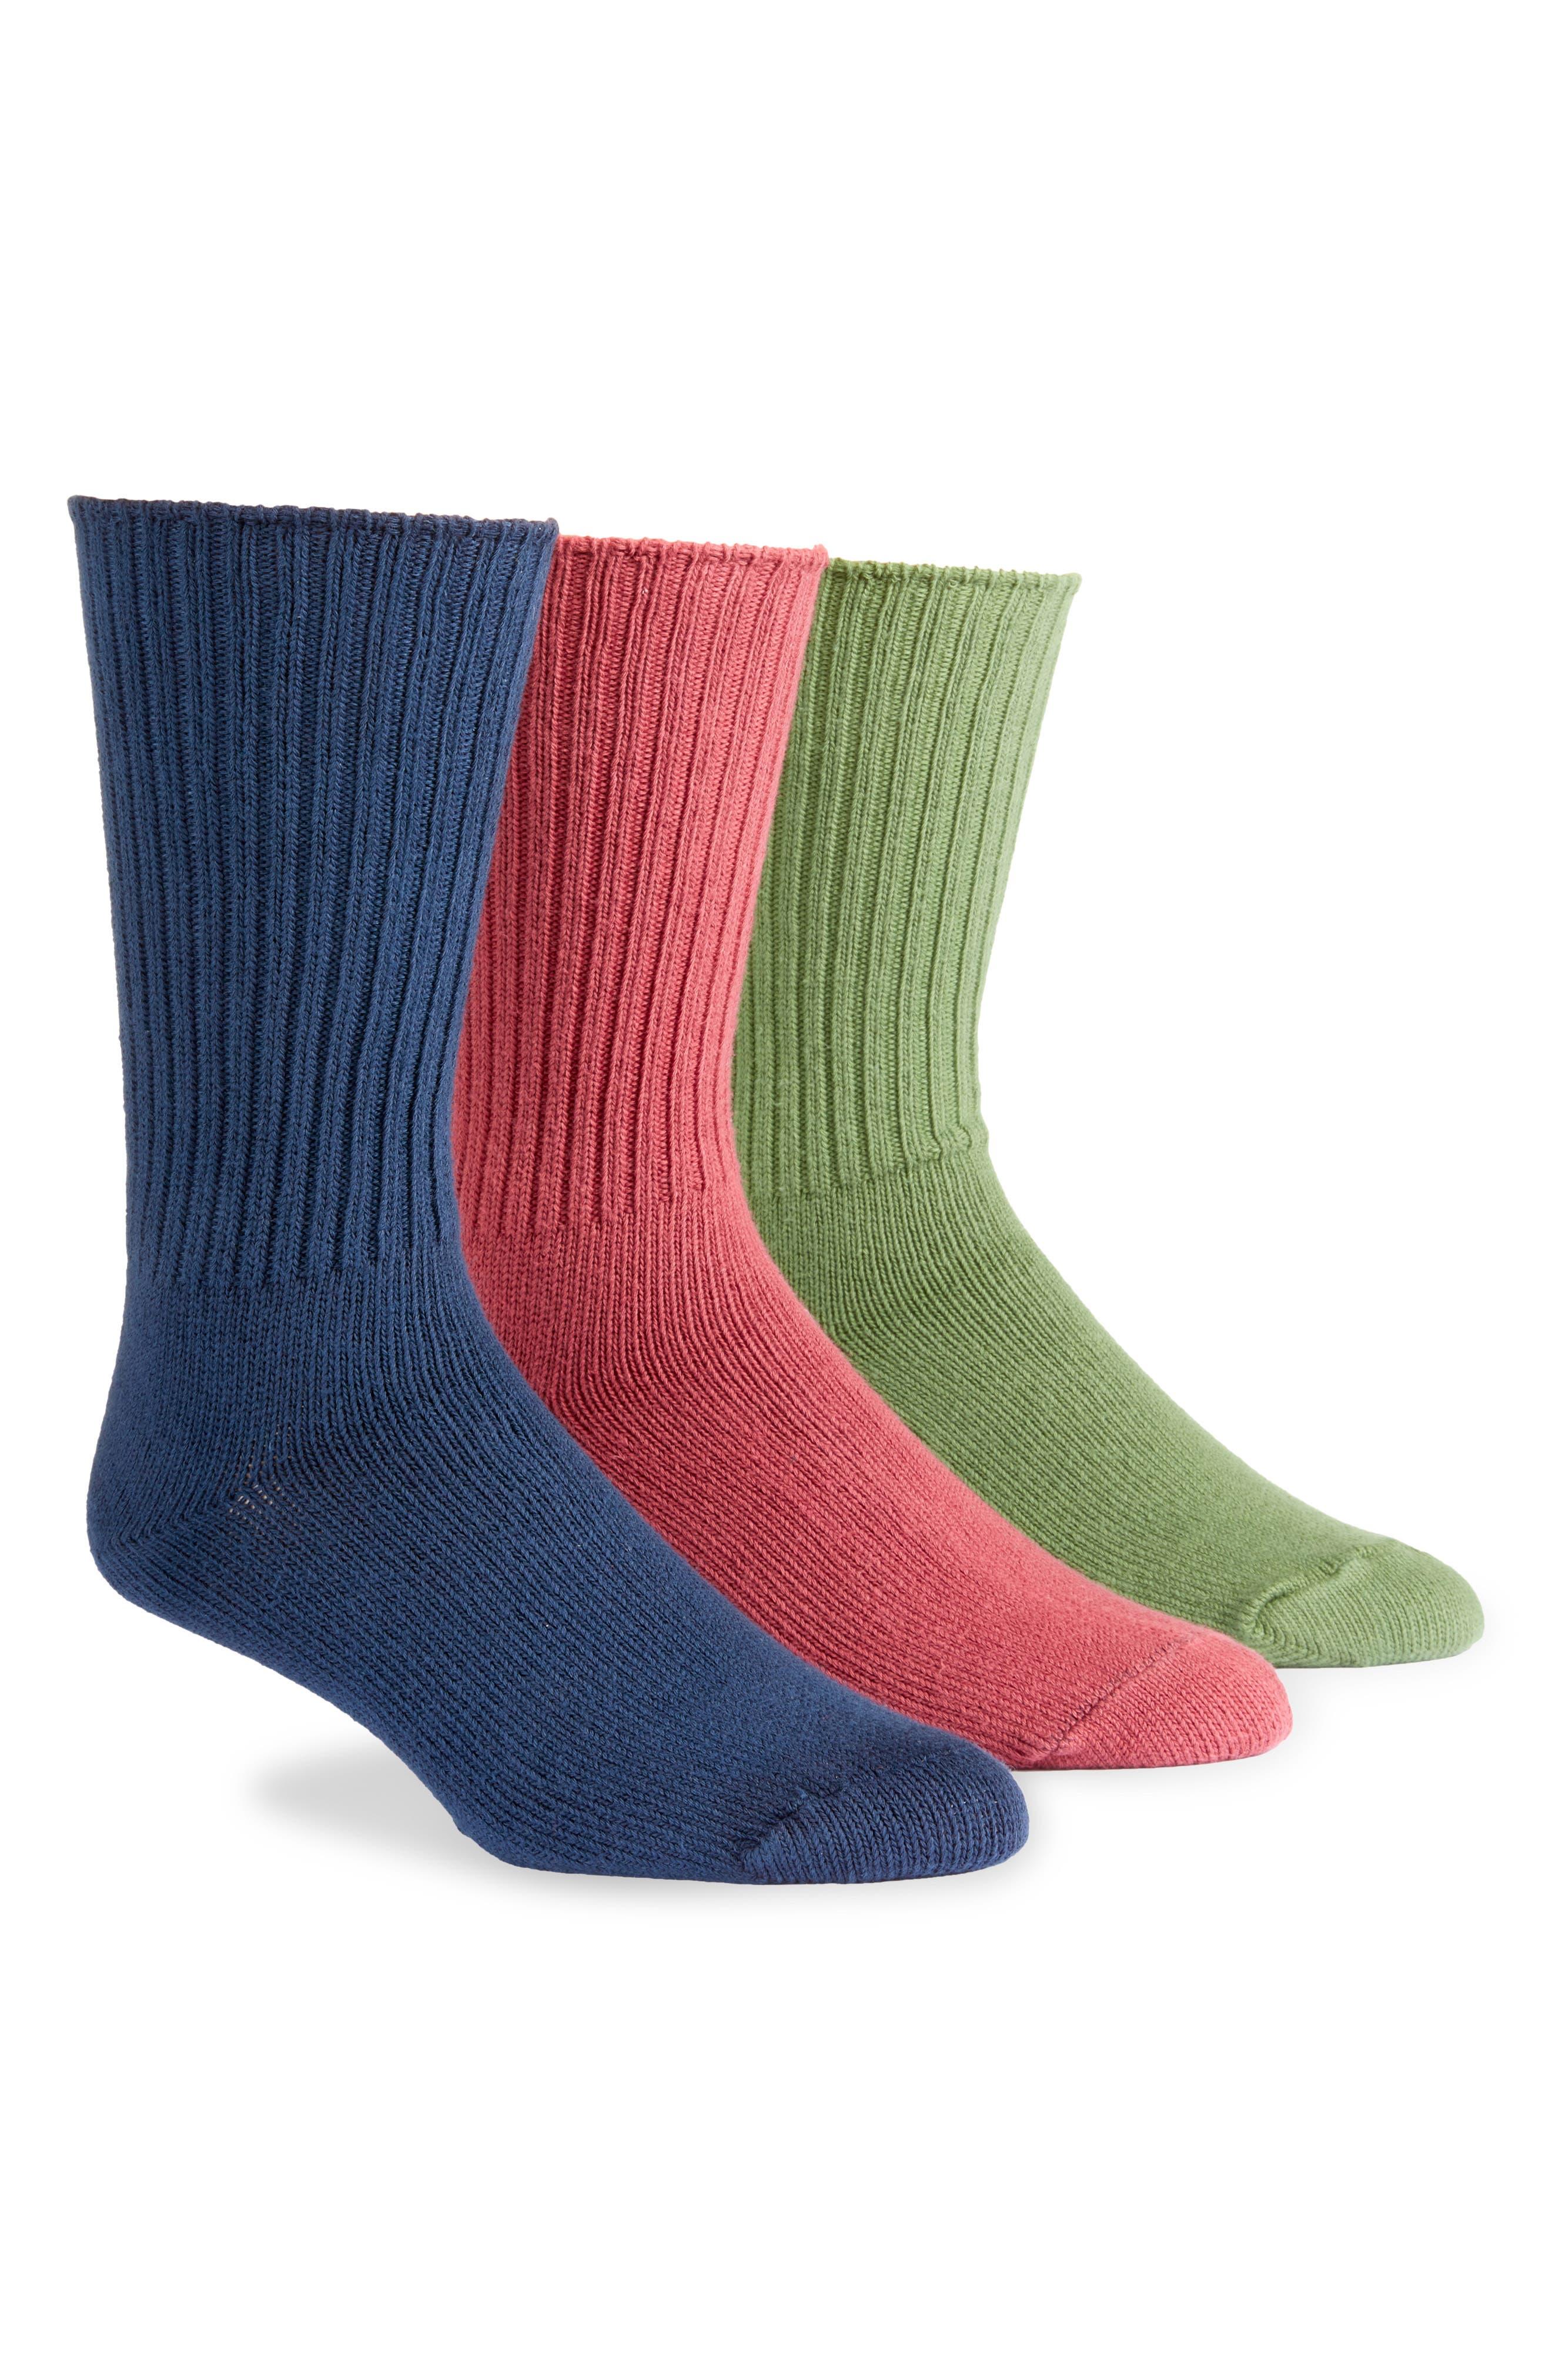 Assorted 3-Pack Organic Cotton Blend Crew Socks